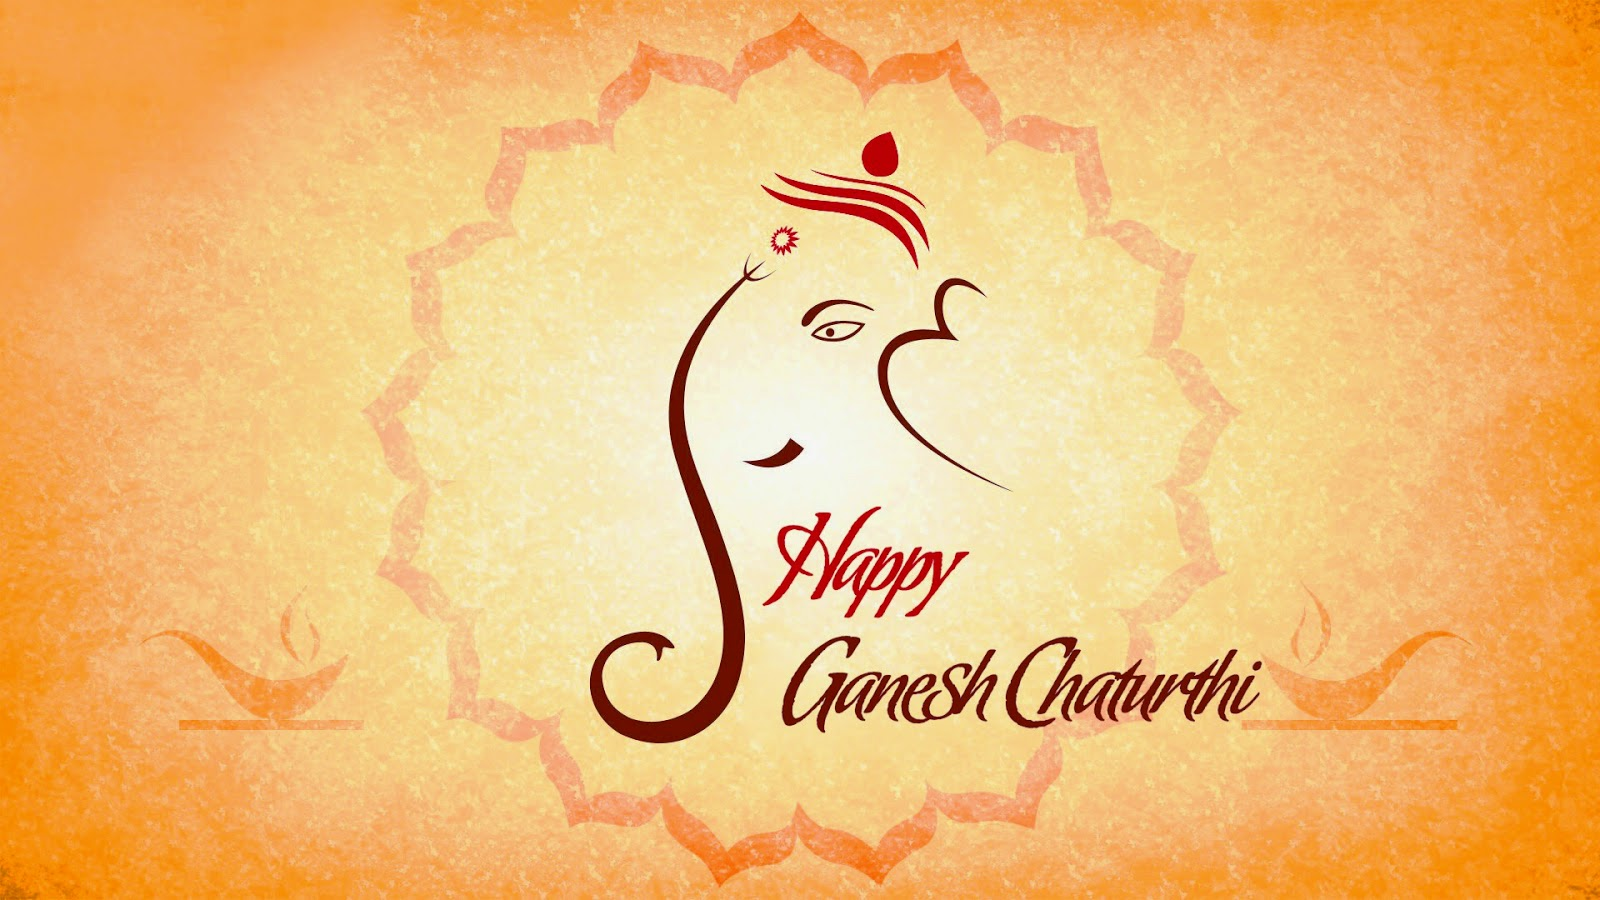 Ganpati Bappa Wallpaper 2014 3d श्री Happy Ganesh Chaturthi Images And Wallpapers 2016